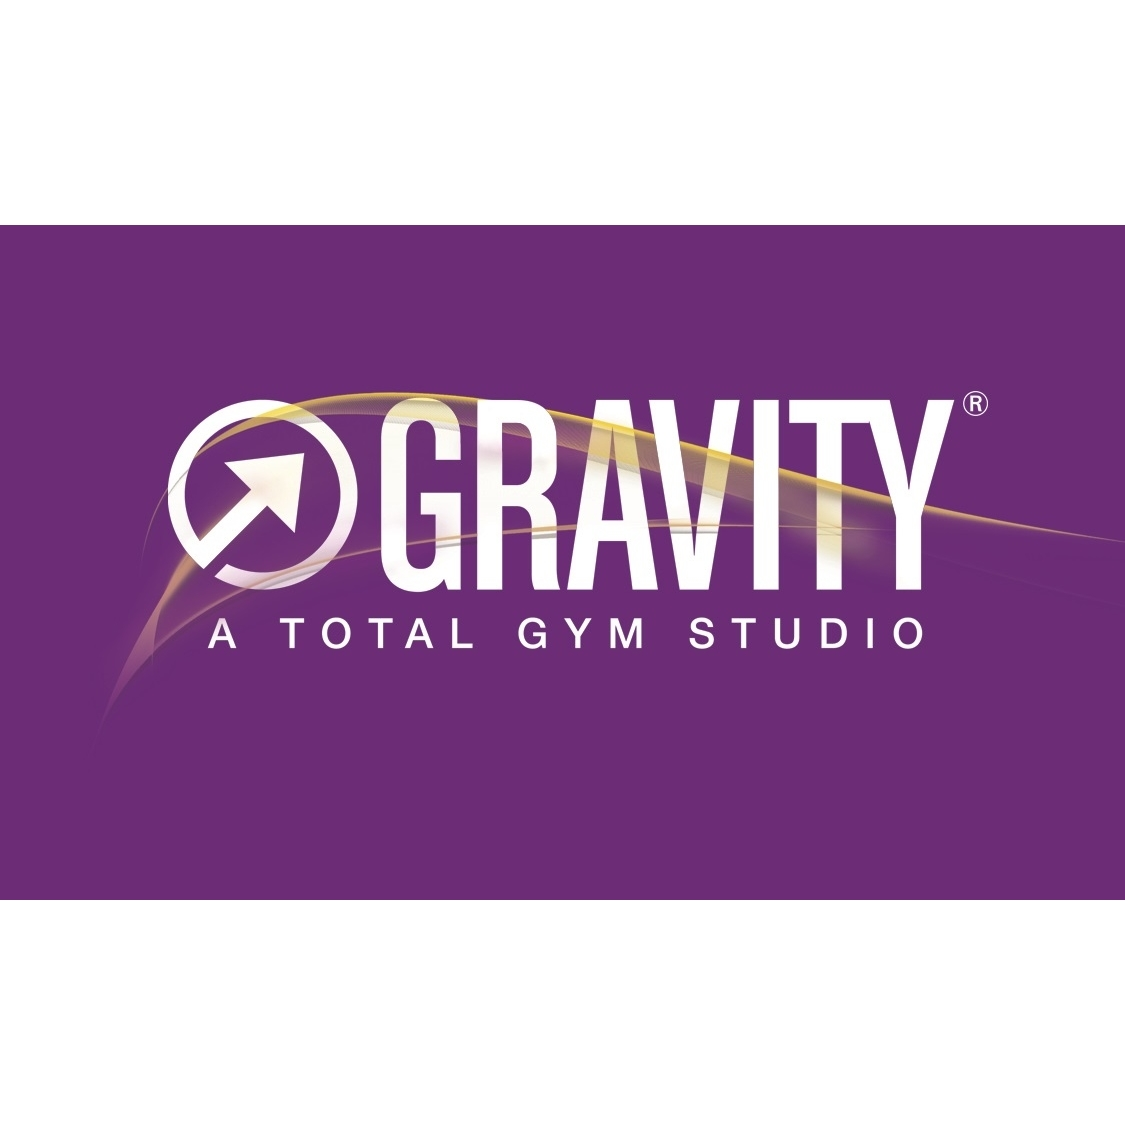 Gravity Gym Studio - Aventura, FL - Personal Trainers